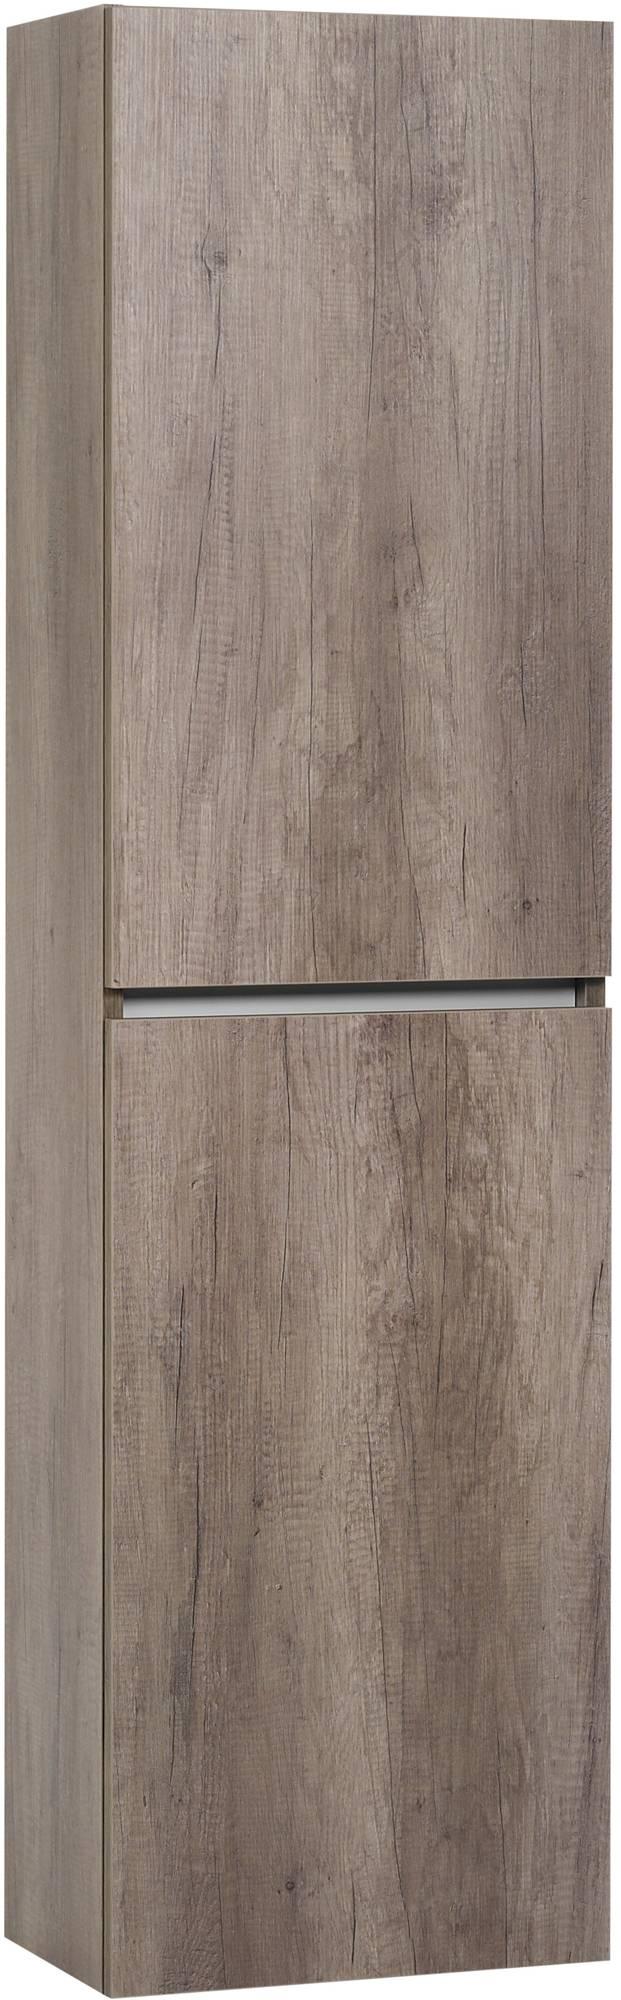 Ben Limara Hoge kast rechts 45x29x165 cm Nebraska Eiken/Aluminium